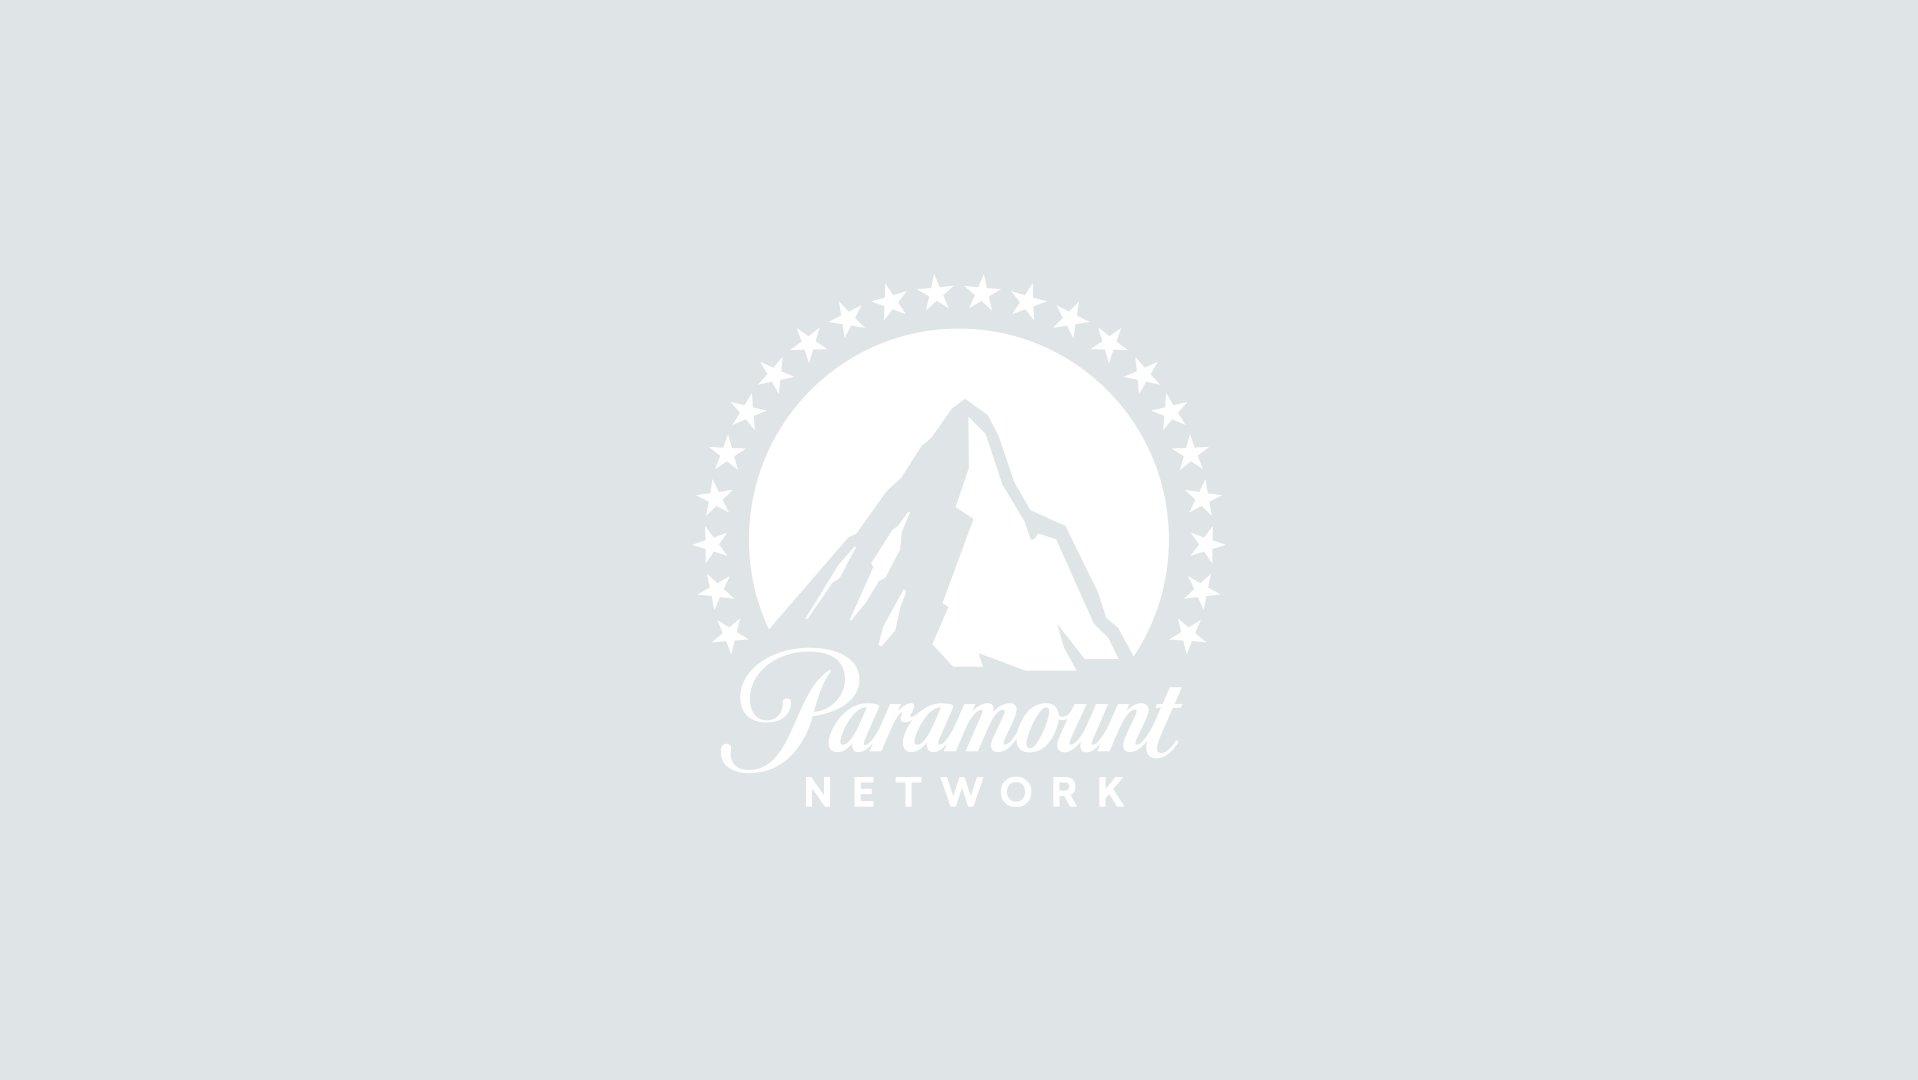 Jennifer Grey e Patrick Swayze (Dirty Dancing - Balli proibiti), foto: Getty Images